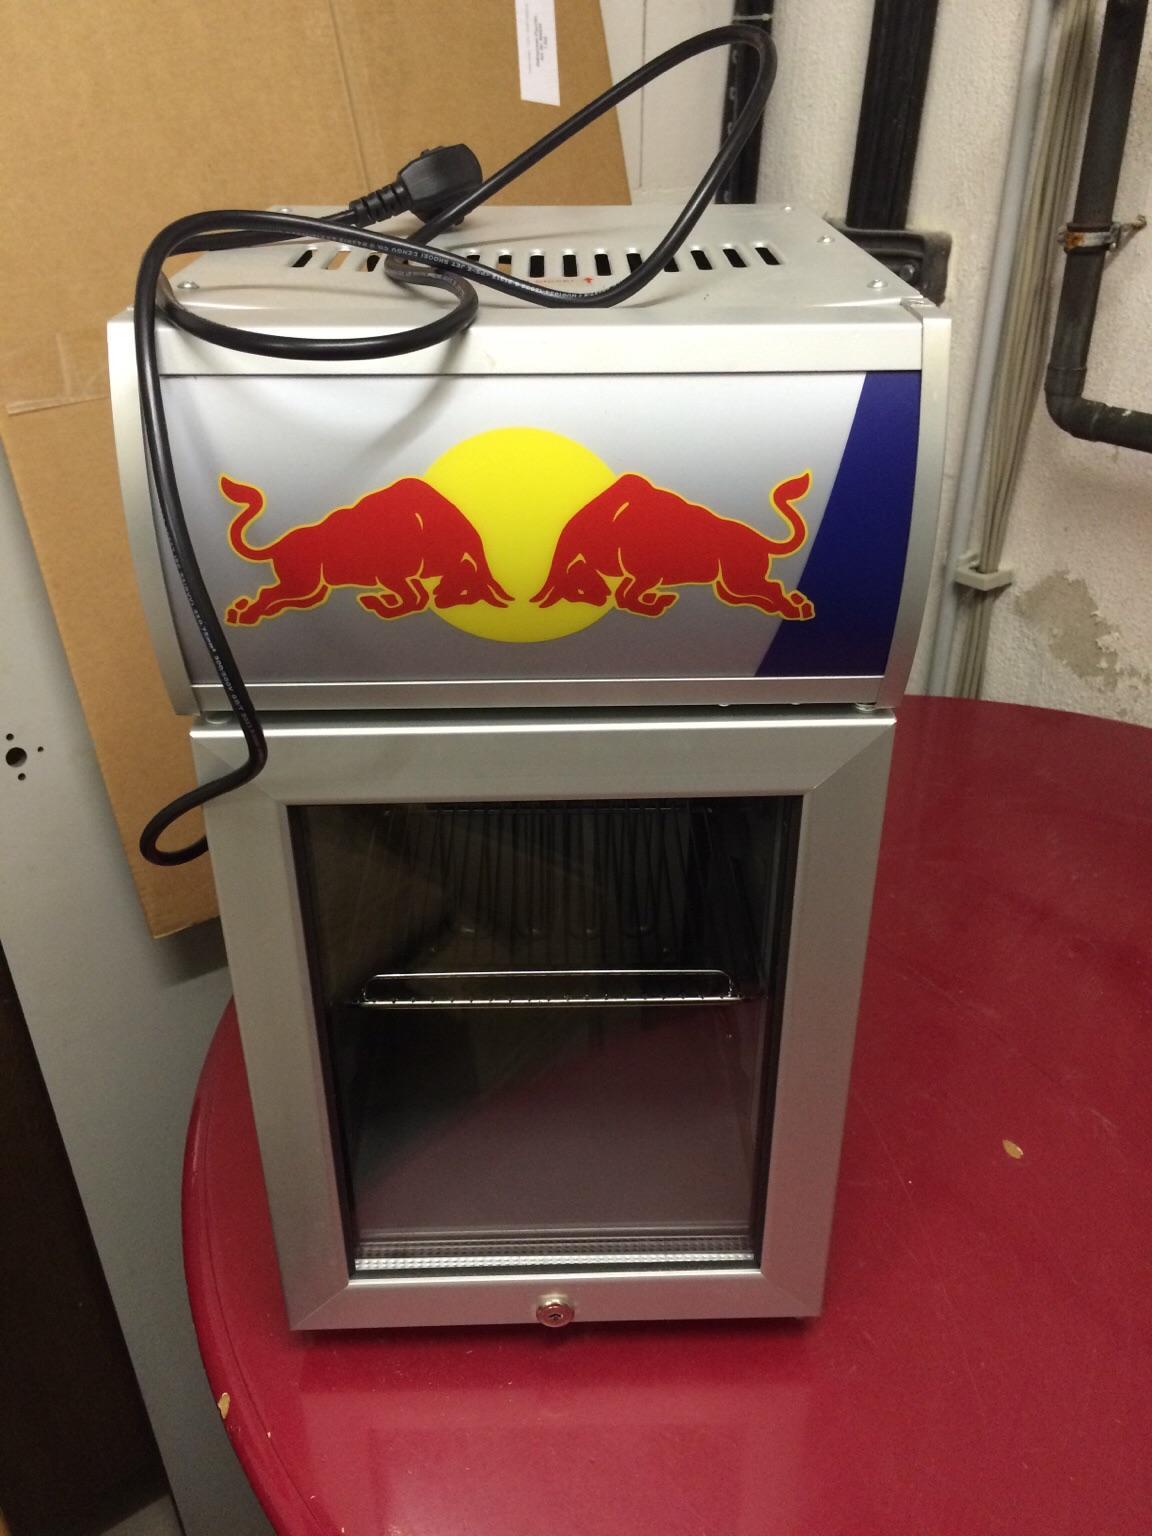 Red Bull Kühlschrank Mini Cooler : Gebraucht red bull mini kühlschrank baby cooler gastro in